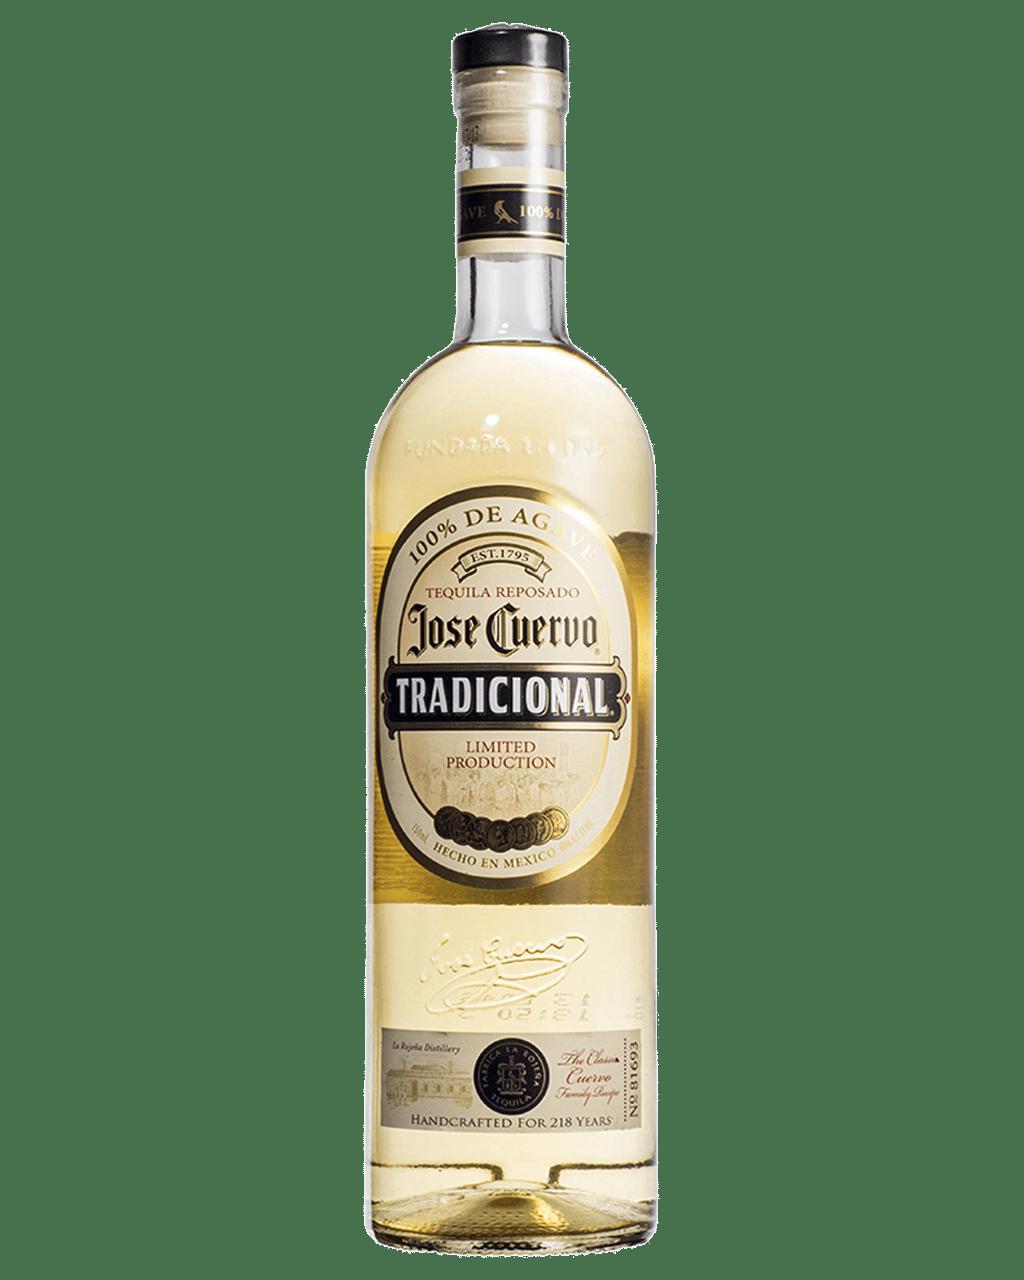 jose cuervo tradicional reposado 750ml dan murphy s buy wine